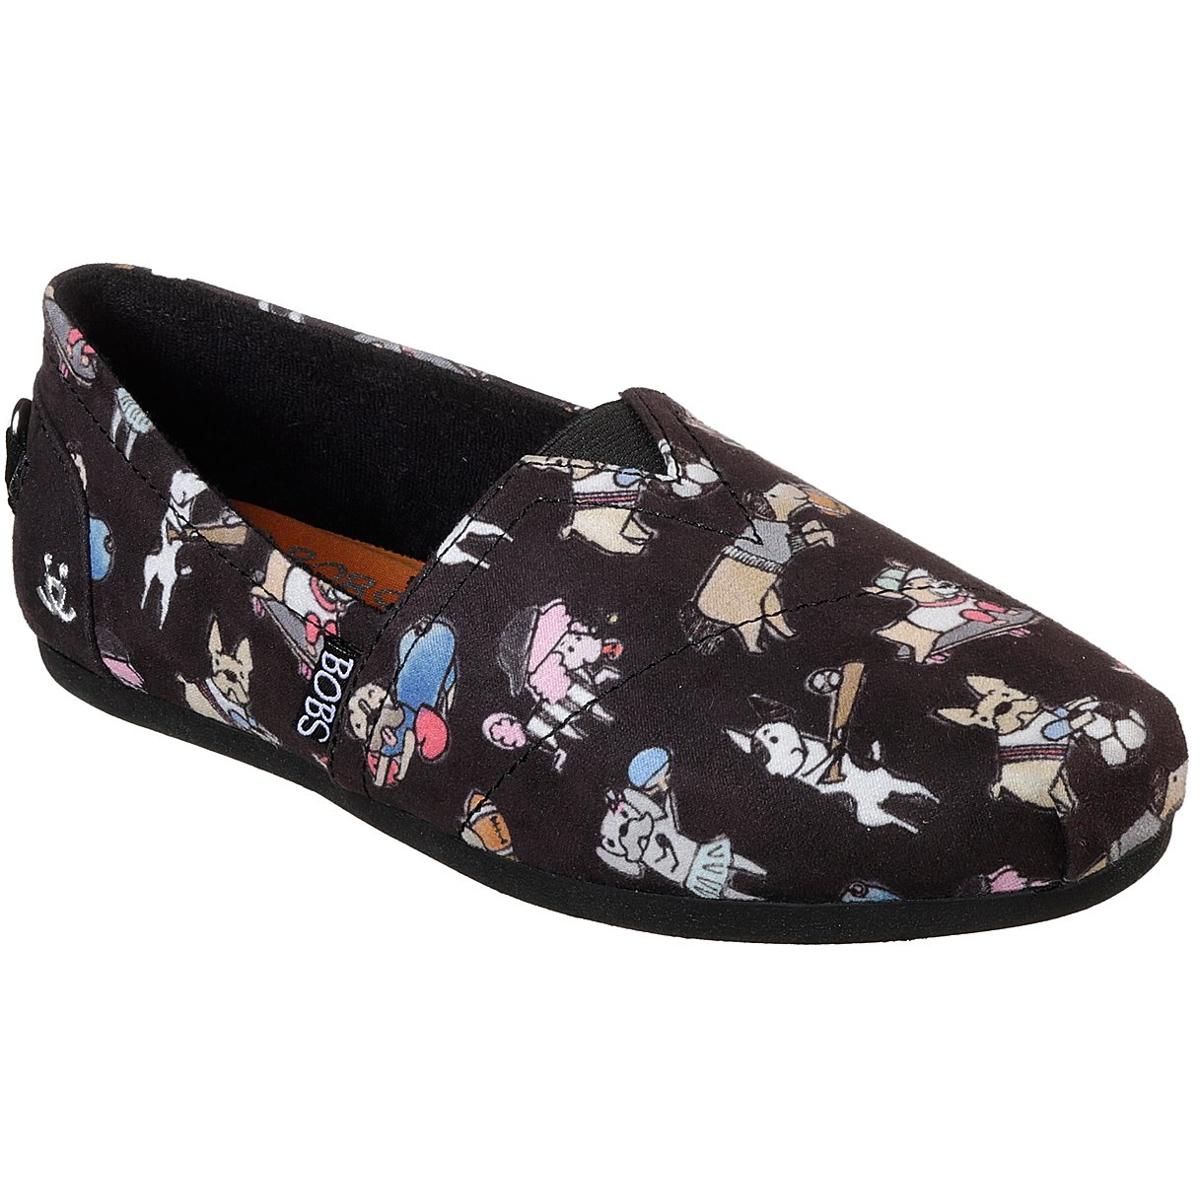 Skechers Women's Bobs Plush - Go Fetch Casual Slip-On Shoes - Black, 8